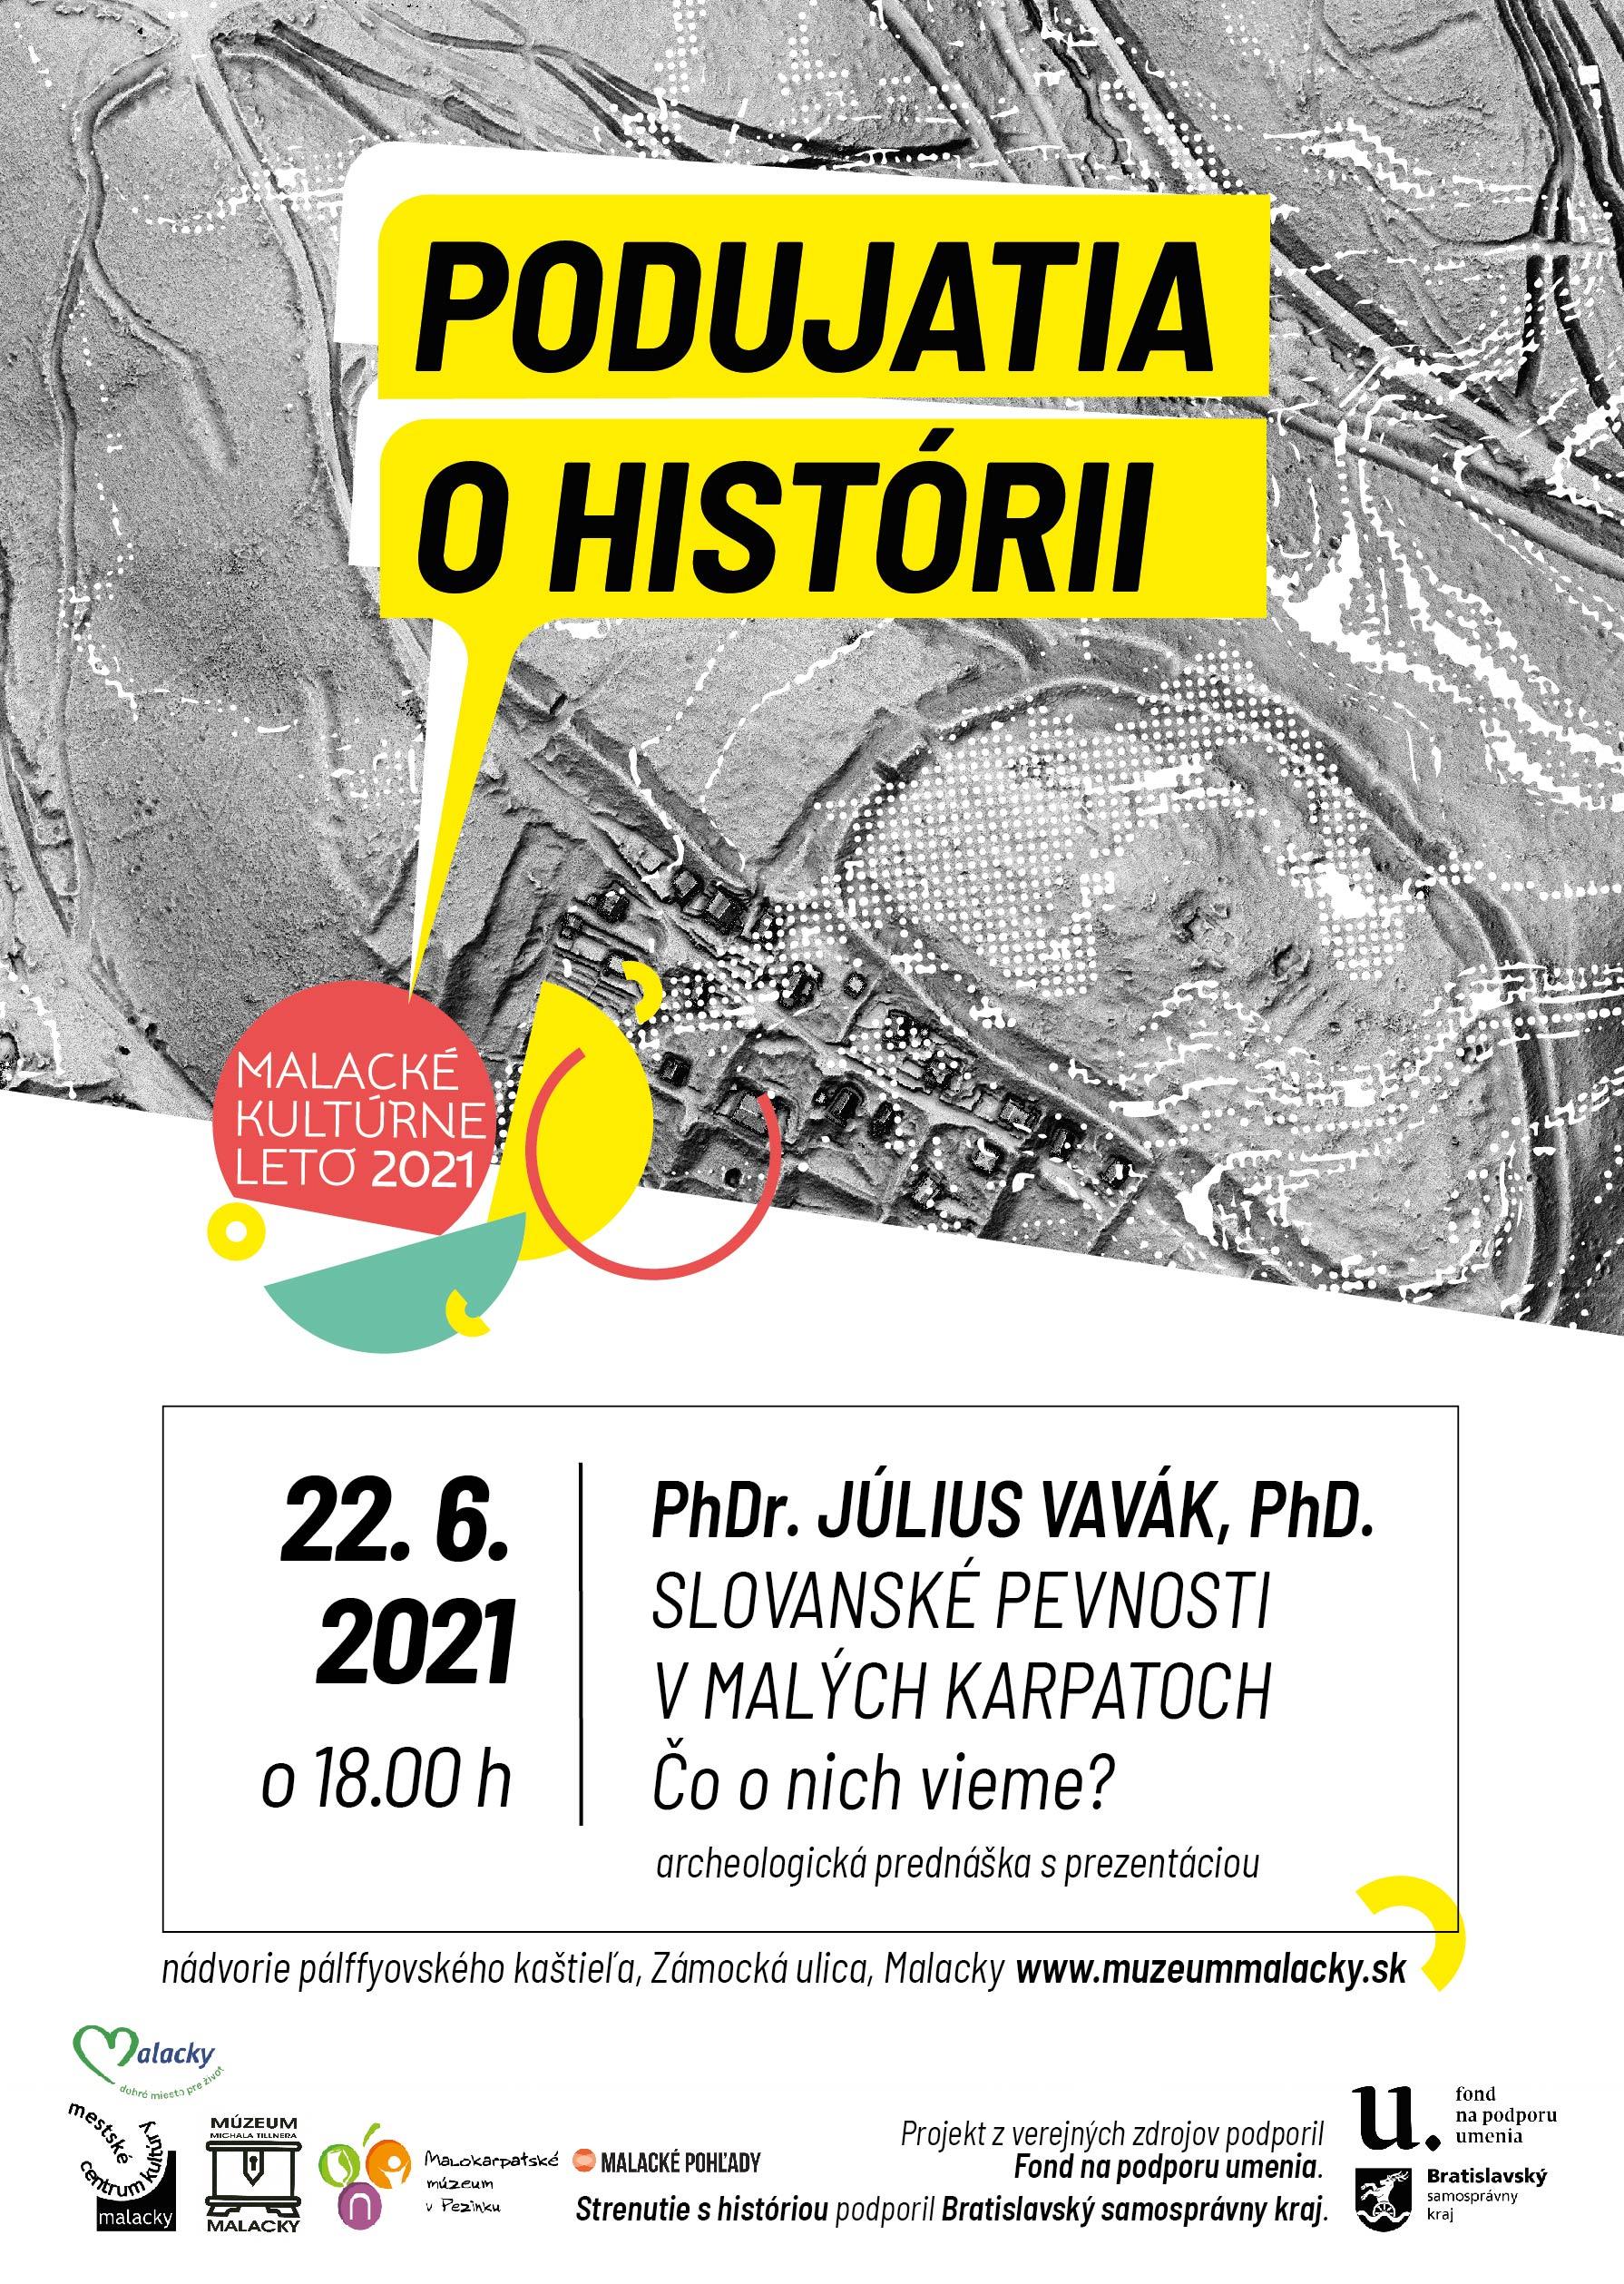 WEB_mkl_2021_podujatia_o_historii_01_vavak_Kreslic pltno 1jpg